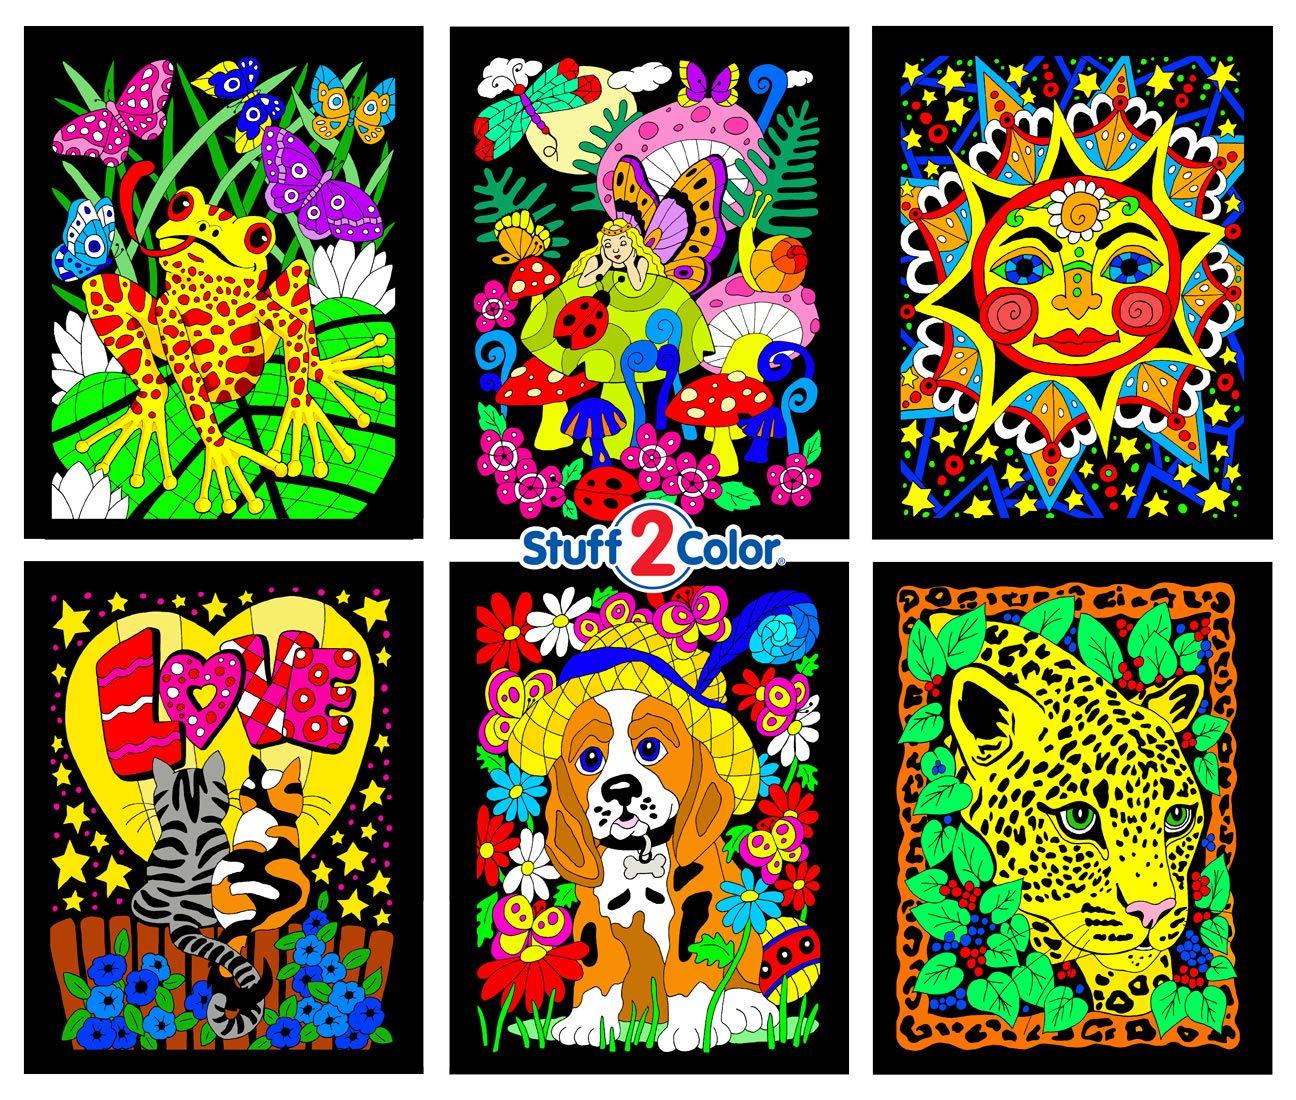 Amazon.com: Sunshine, Kittens, Leopard, Puppy, Fairy, Frog - 6 Fuzzy ...